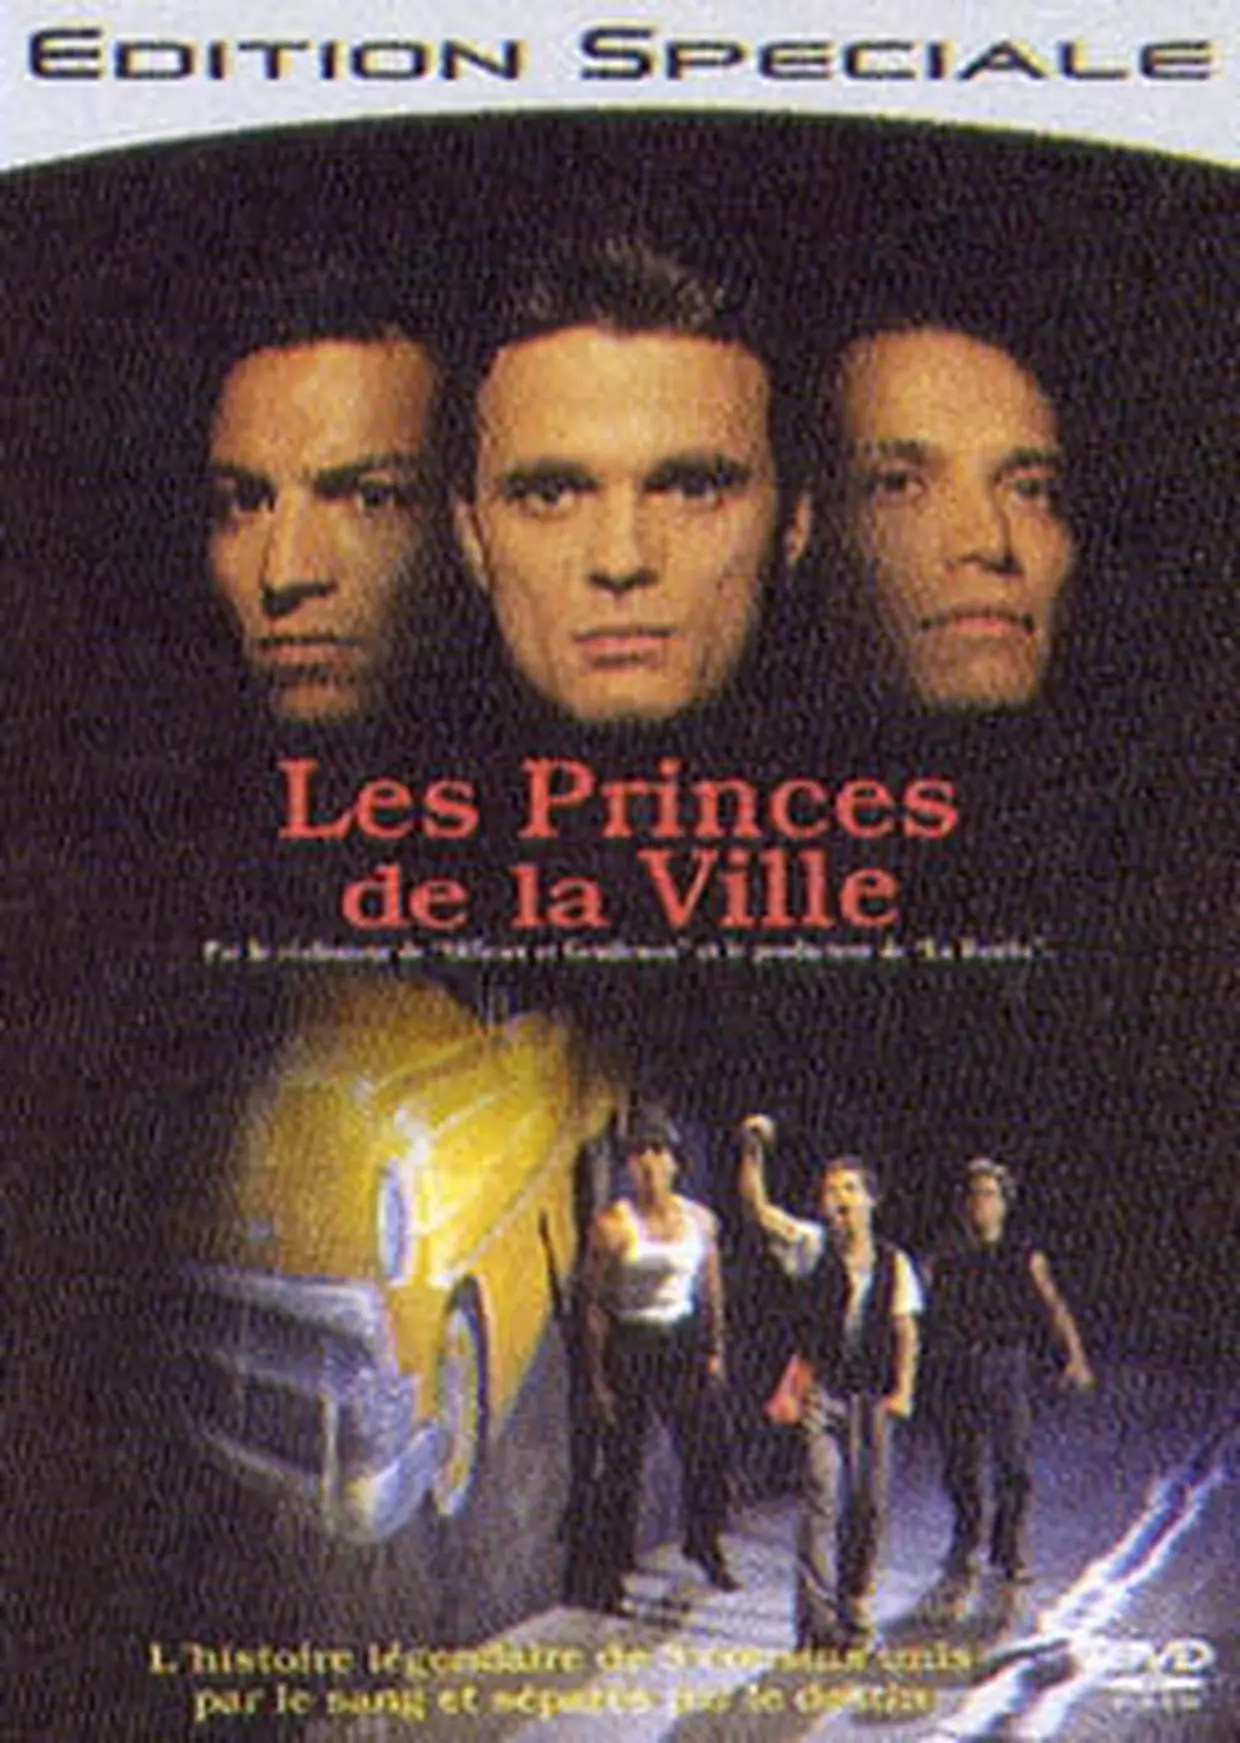 Le Prince De La Ville : prince, ville, Princes, Ville, Bande, Annonce, Film,, Séances,, Streaming,, Sortie,